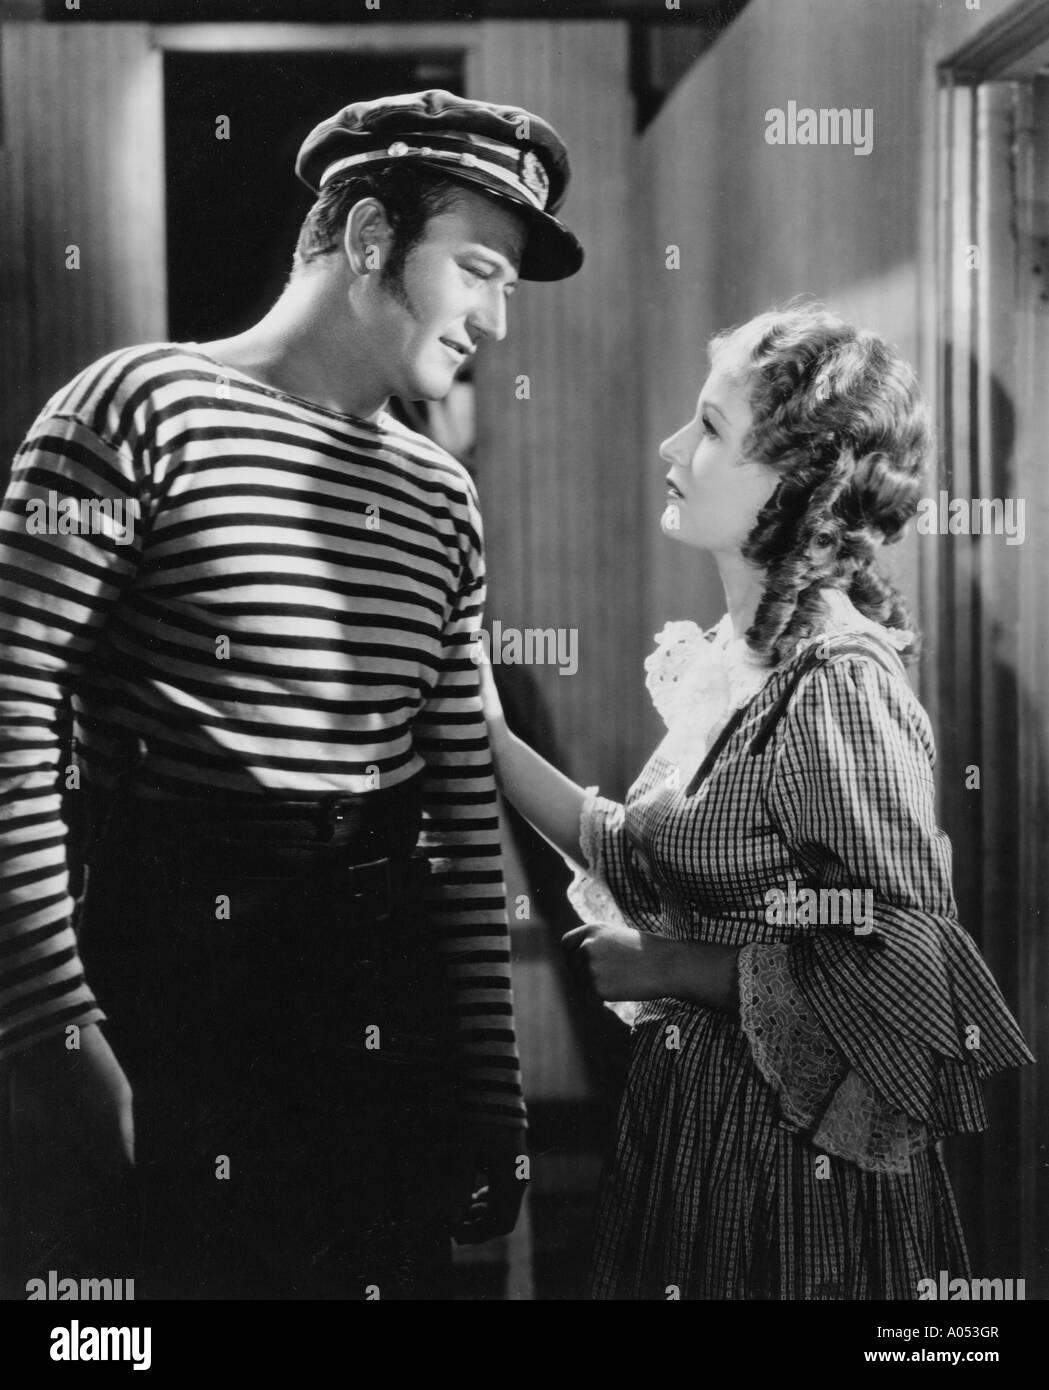 La fin de l'AVENTURE 1937 Universal film avec John Wayne et Diana Gibson Photo Stock